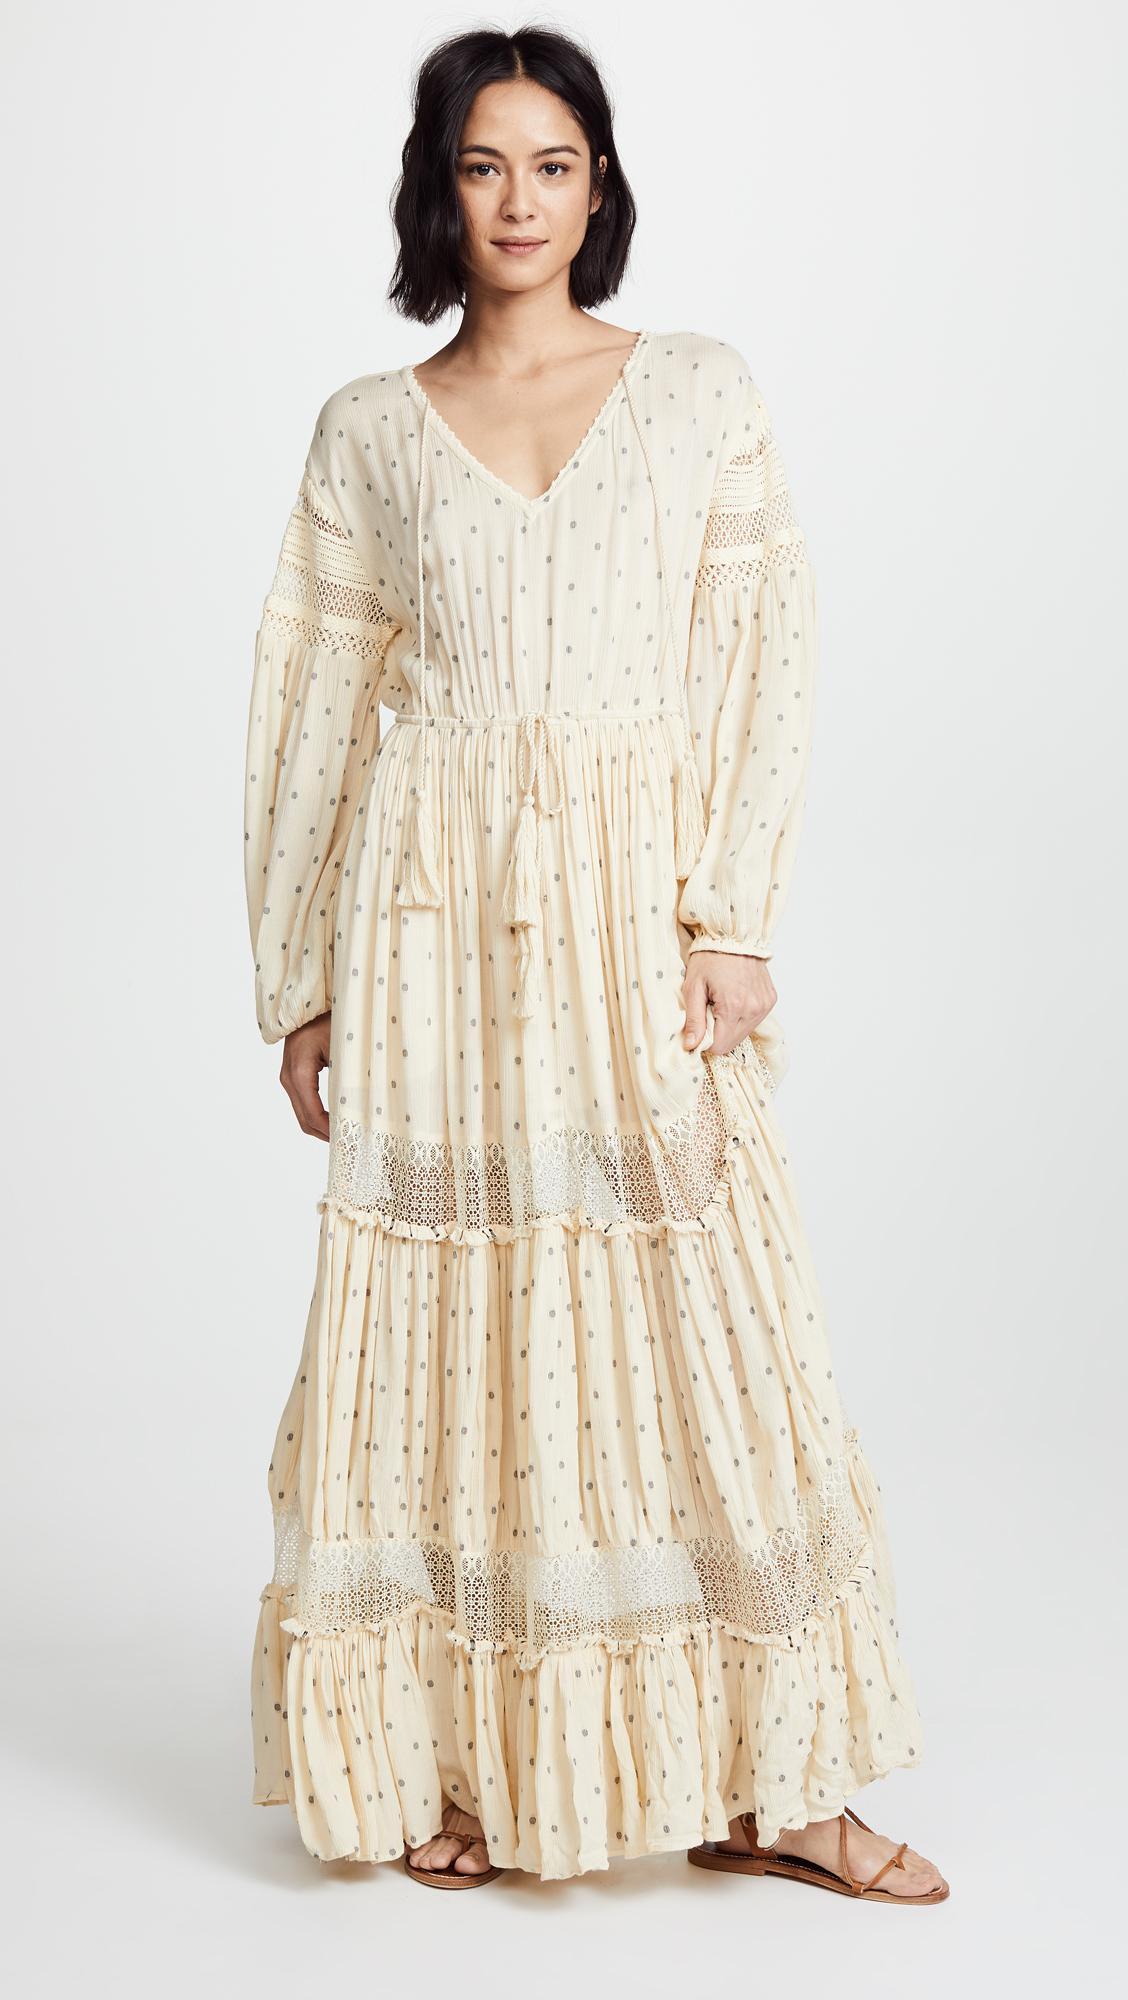 93deff727f82a Free People Sada Maxi Dress in White - Lyst